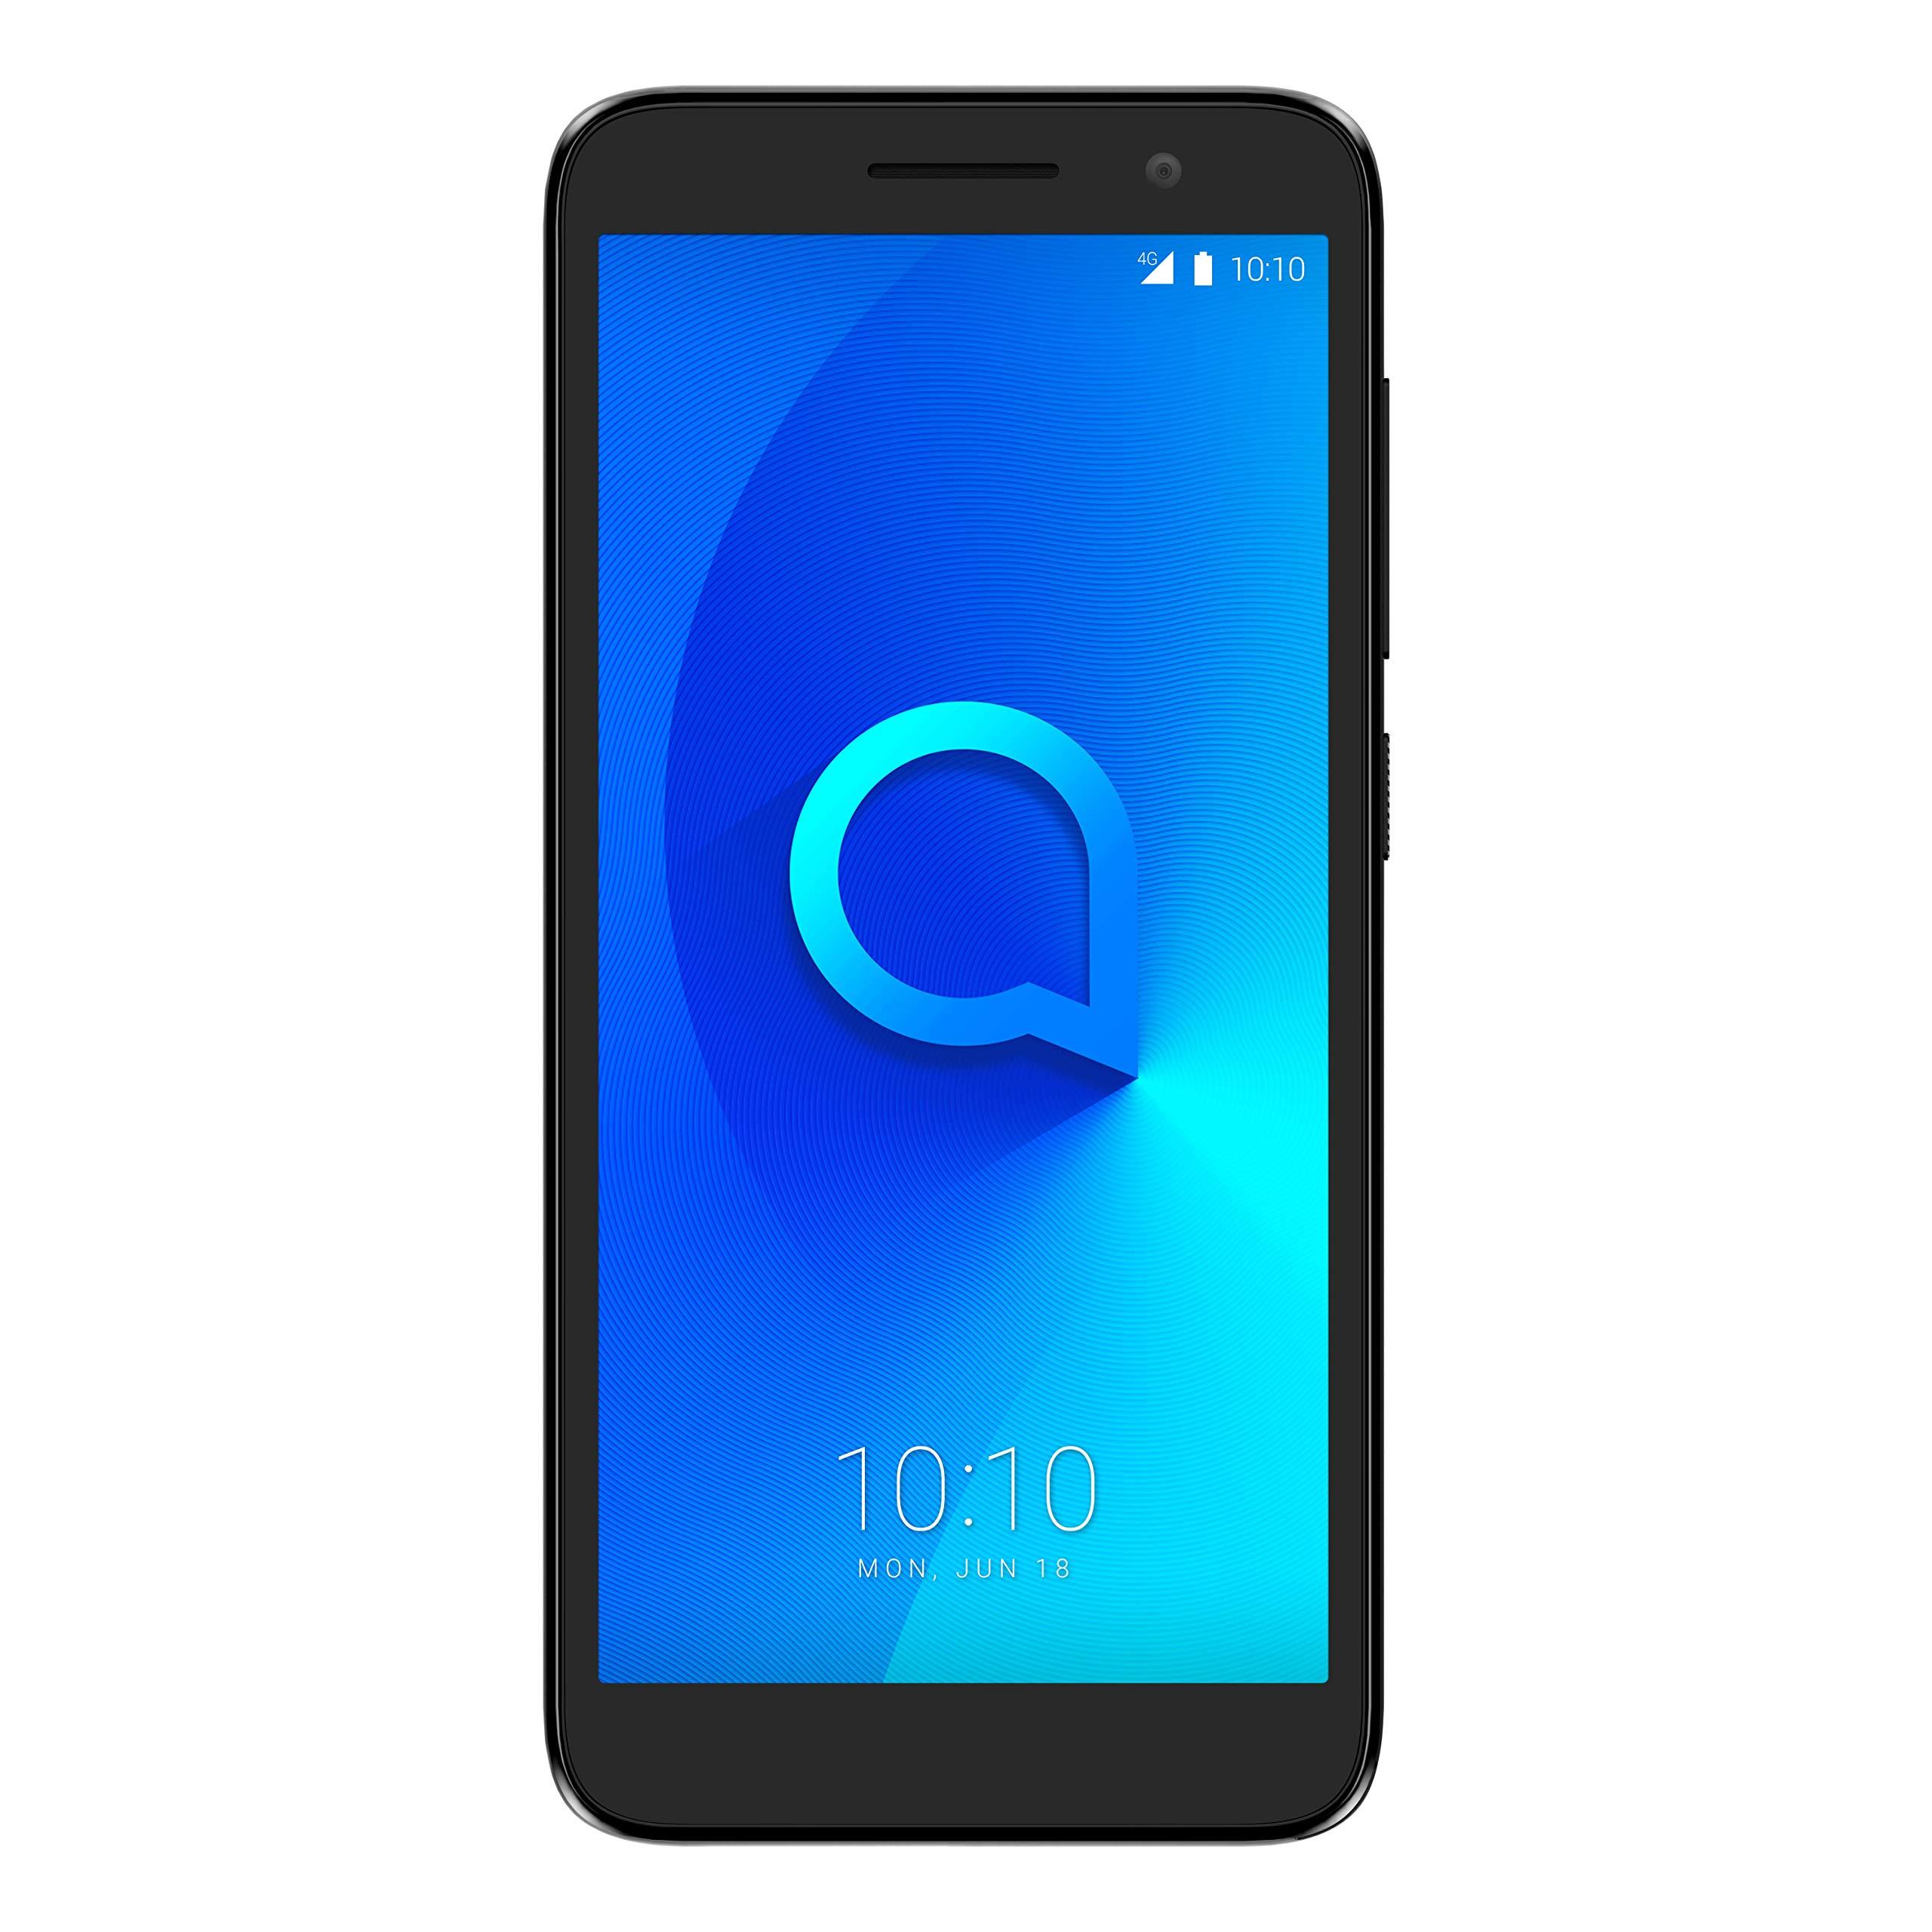 Alcatel 1 (2019) Sim Free Unlocked UK 4G Smartphone, FullView 18:9 Display with 8MP Camera, 1GB RAM / 8GB Storage and Android Oreo (Go edition) - Metallic Black